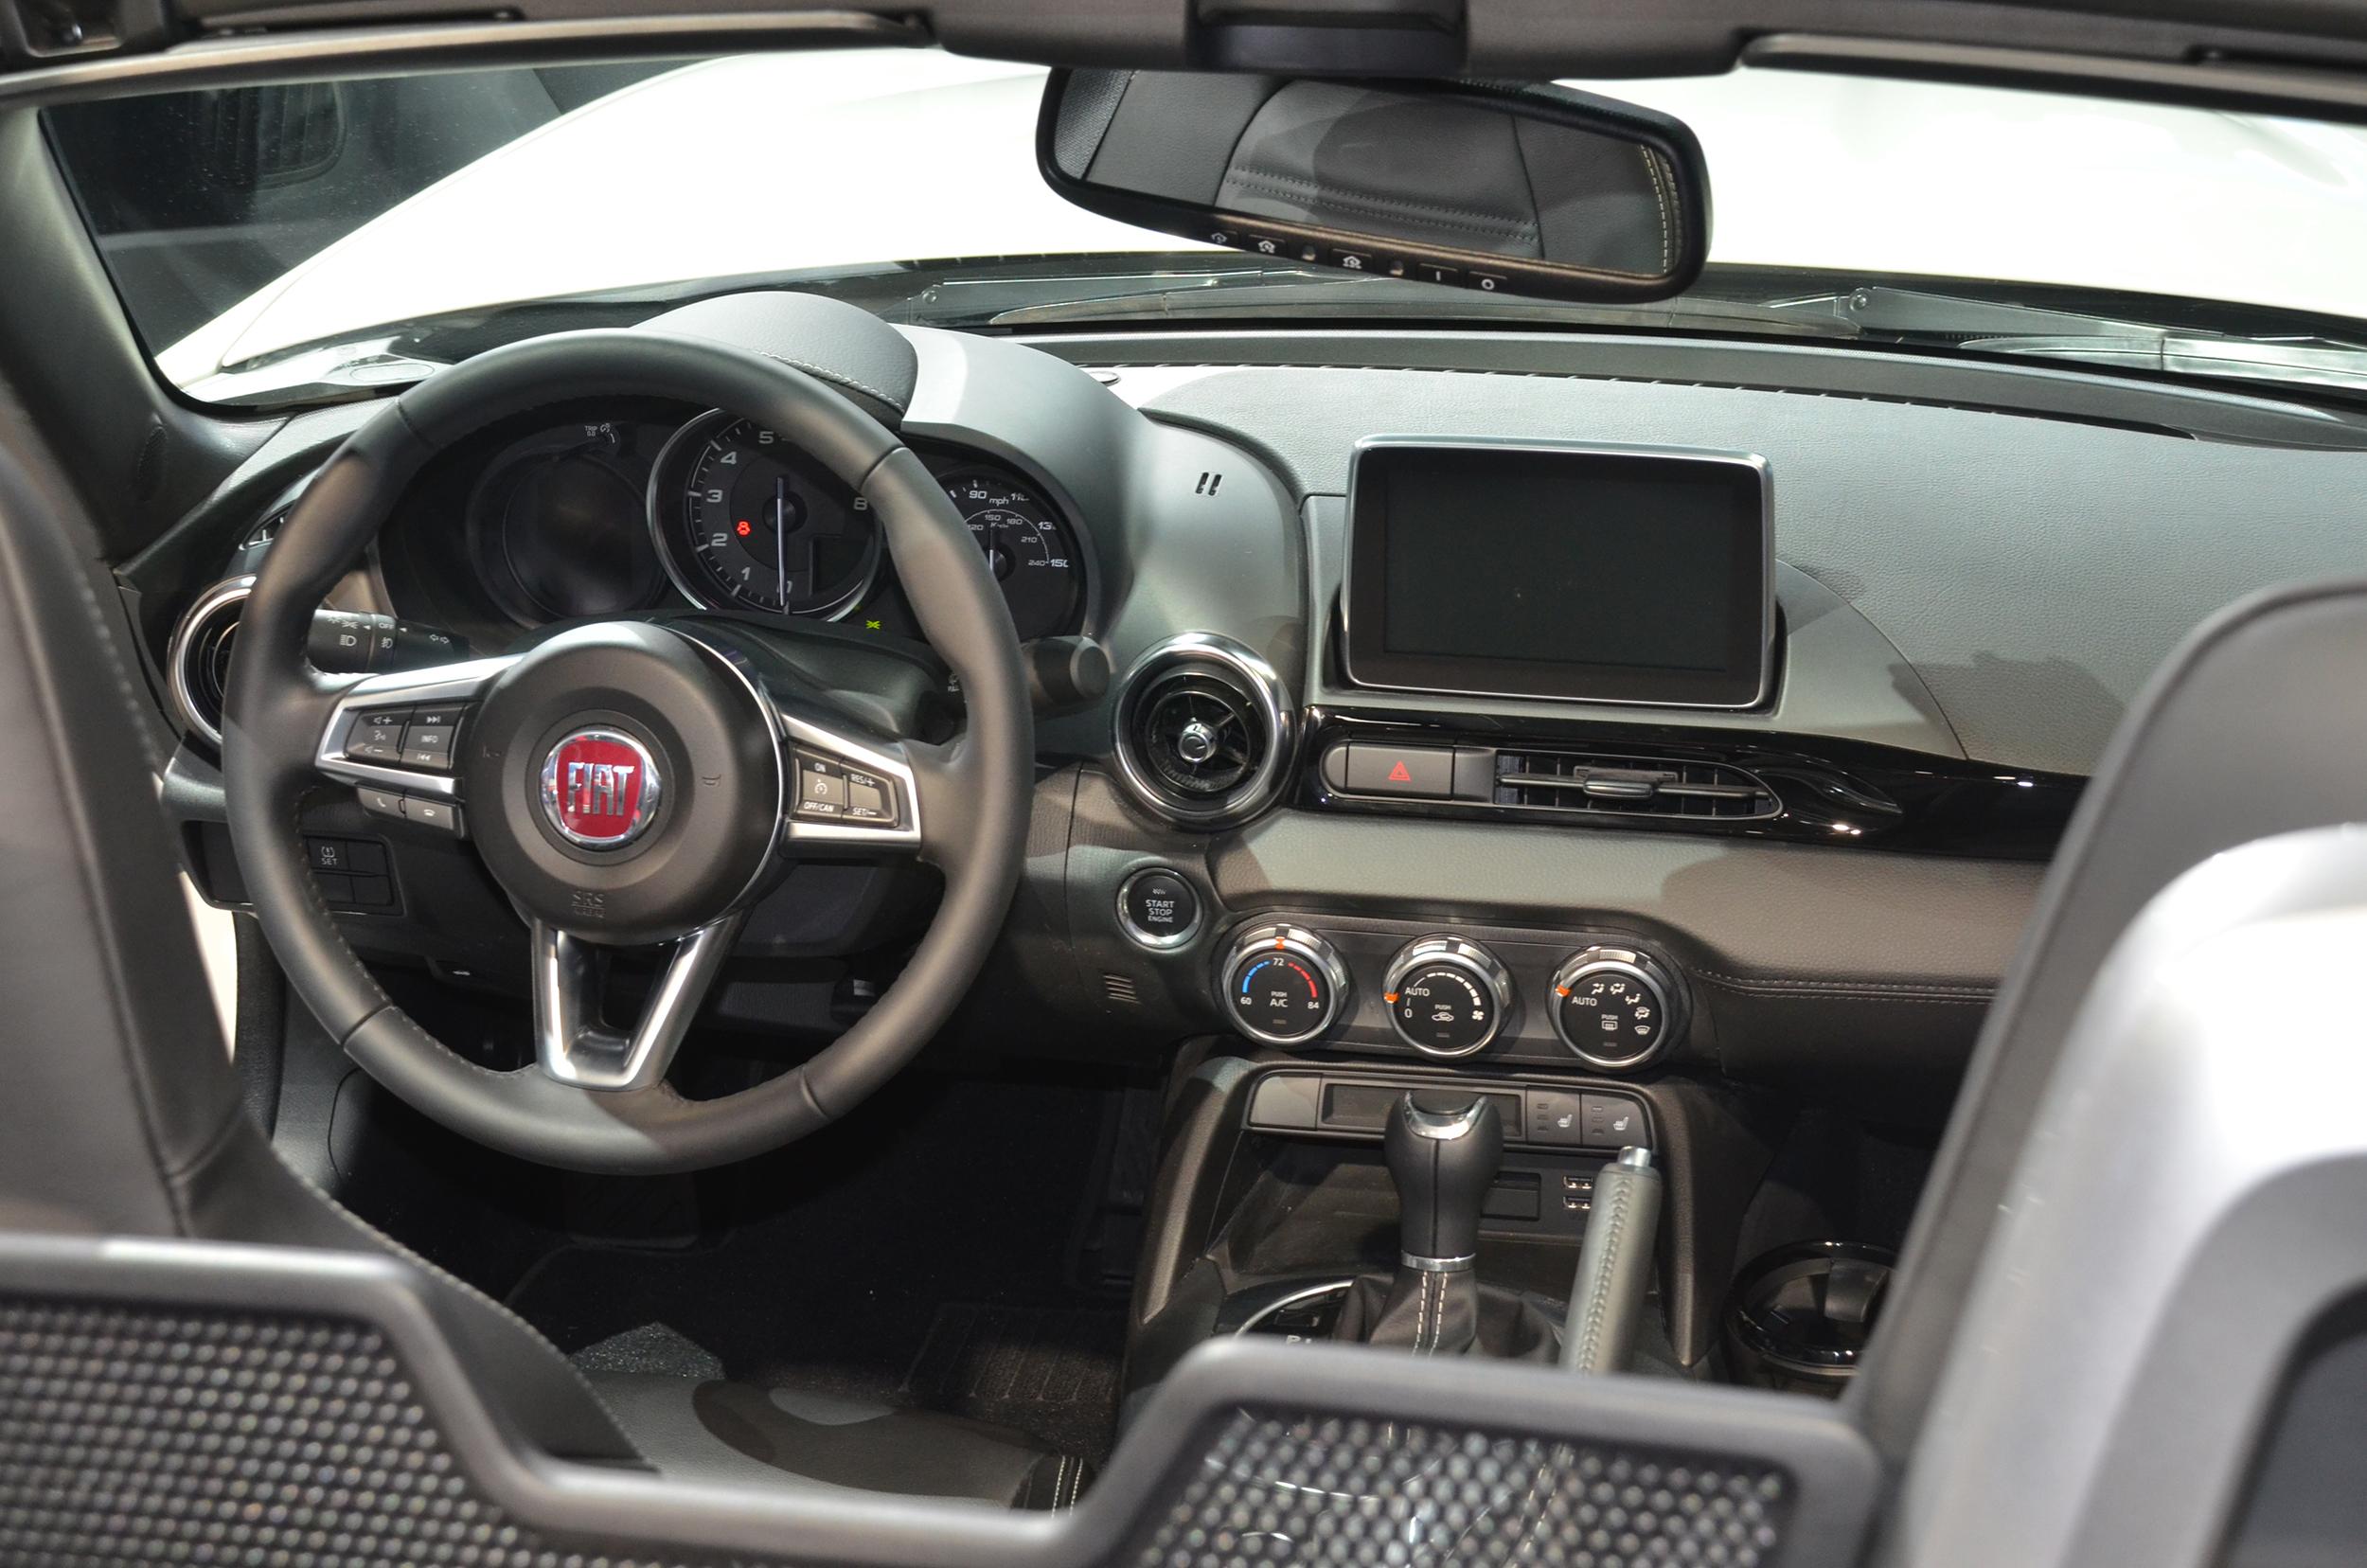 Fiat reveals new 124 Spider at Los Angels Auto Show